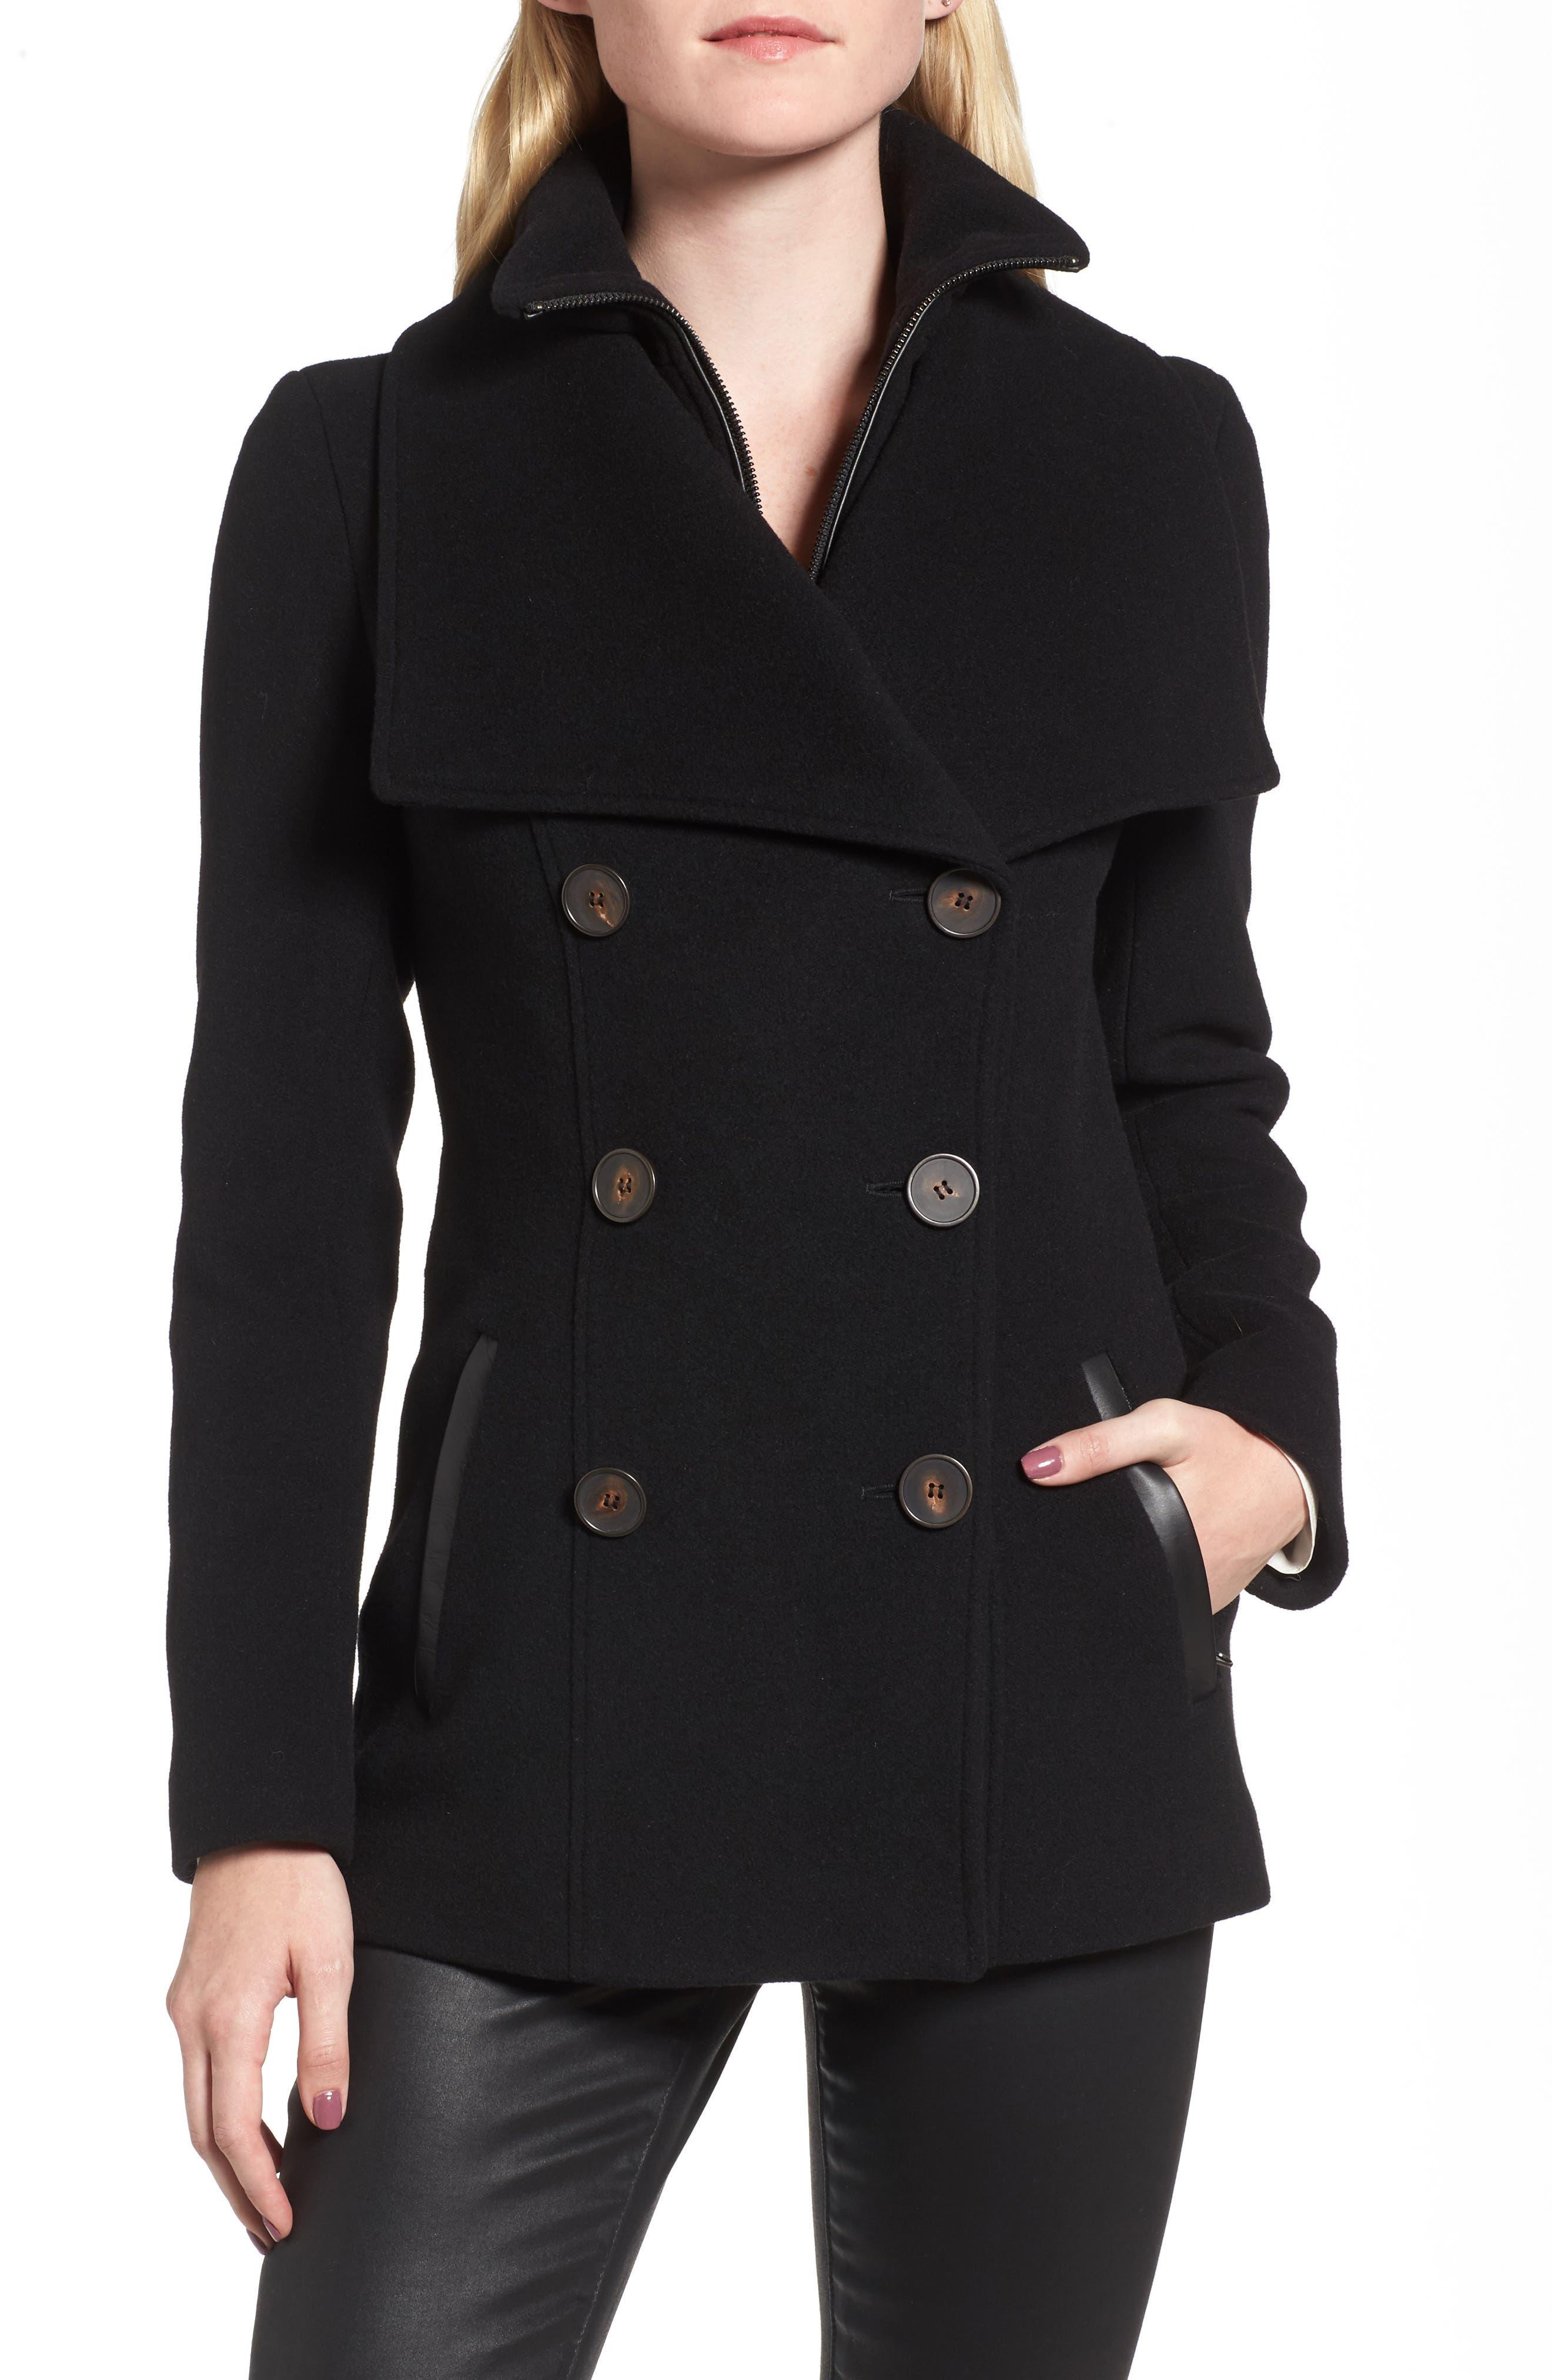 Mackage Norissa Double-Breasted Wool Blend Peacoat